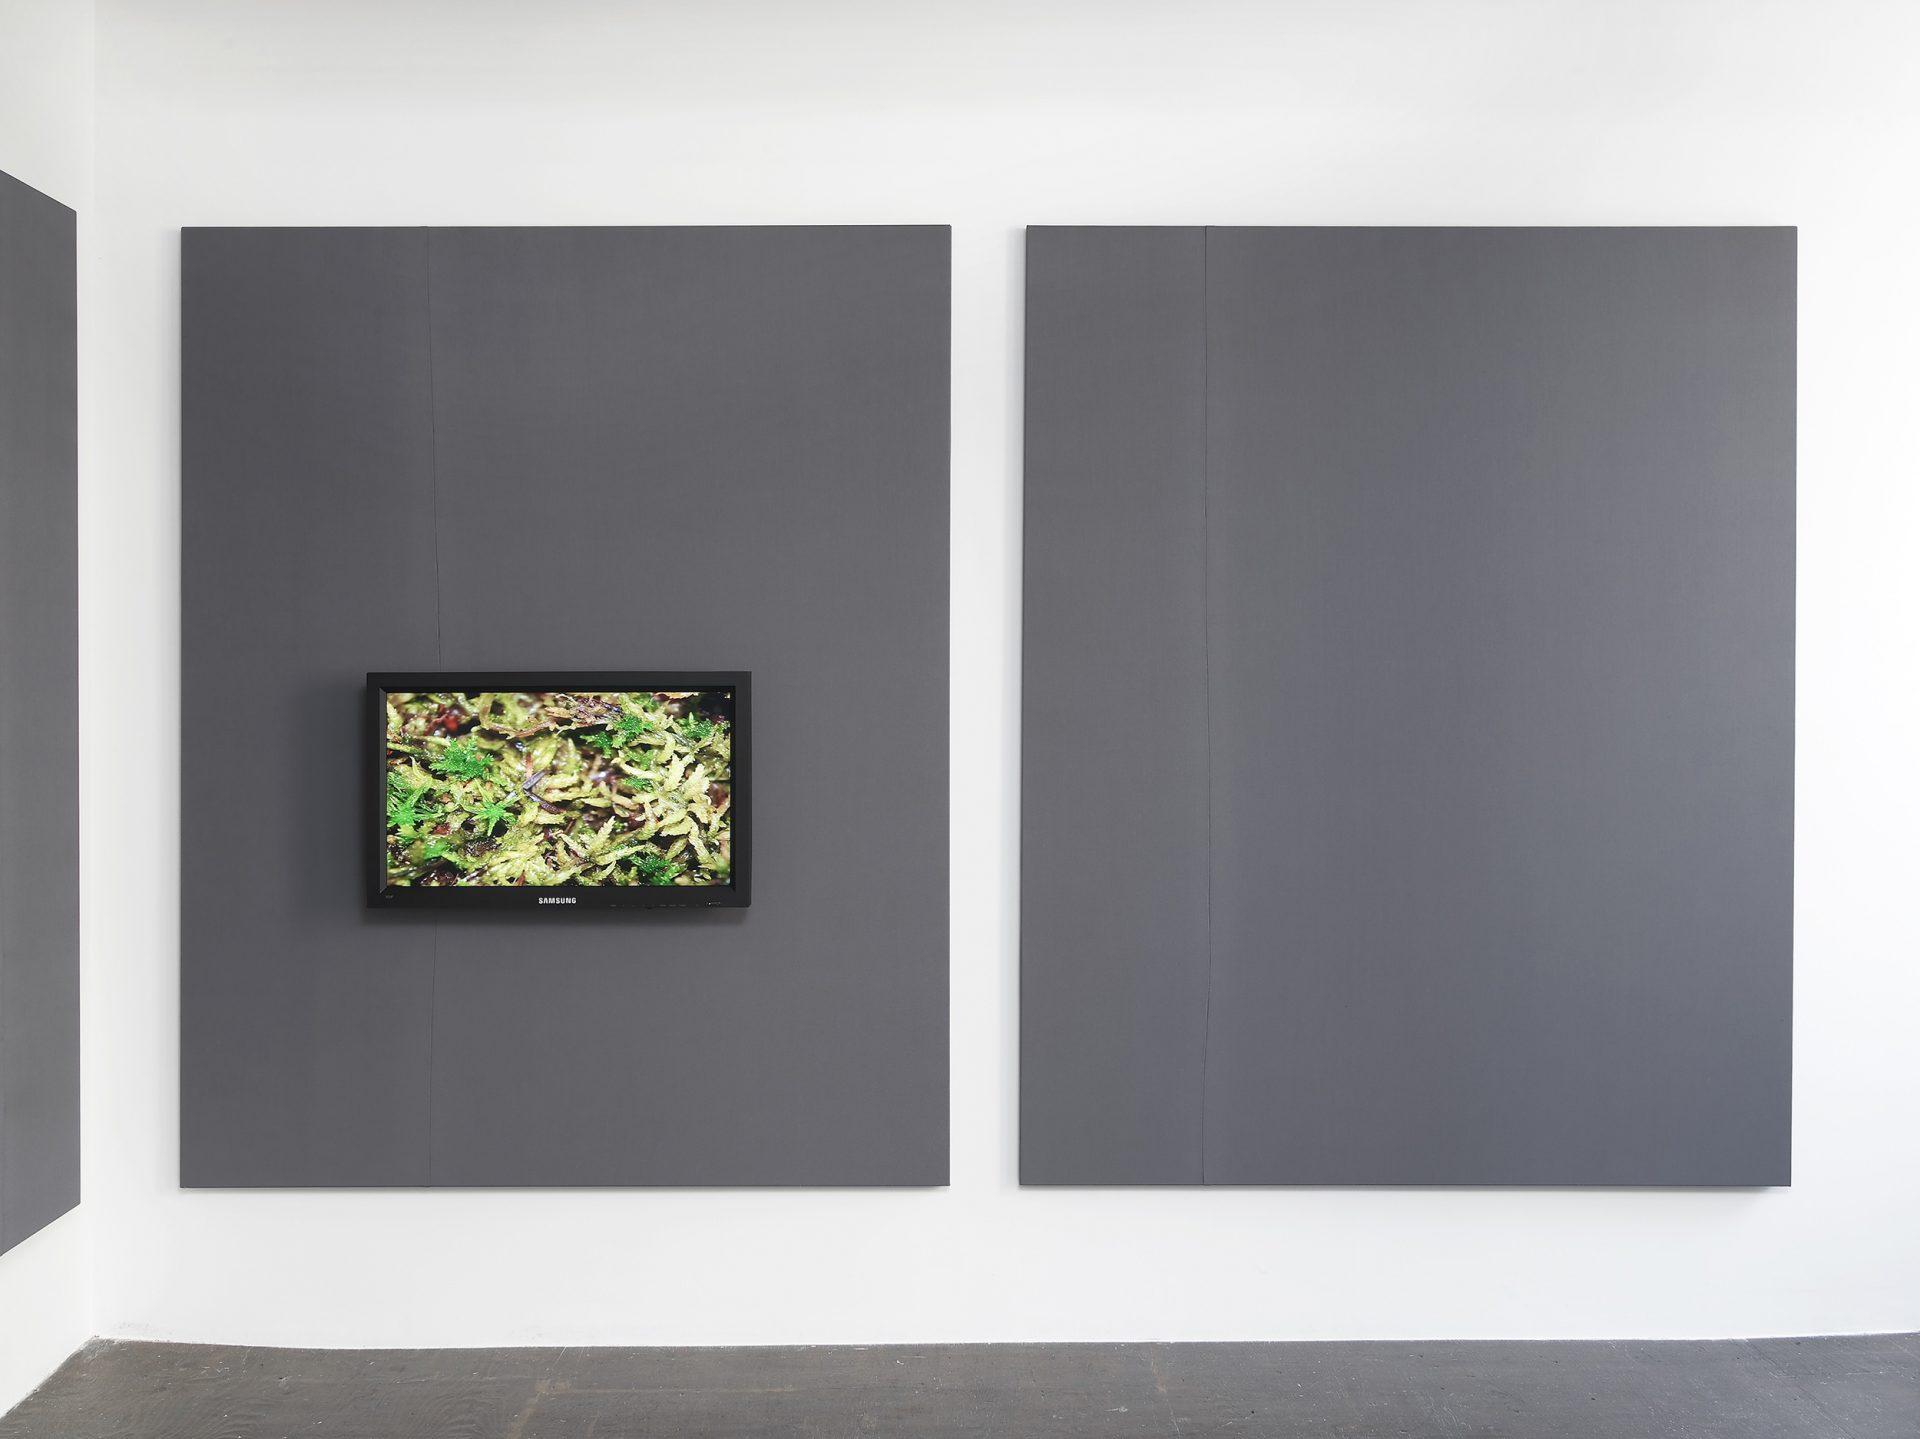 Andrea Büttner: Moos/Moss, 2012